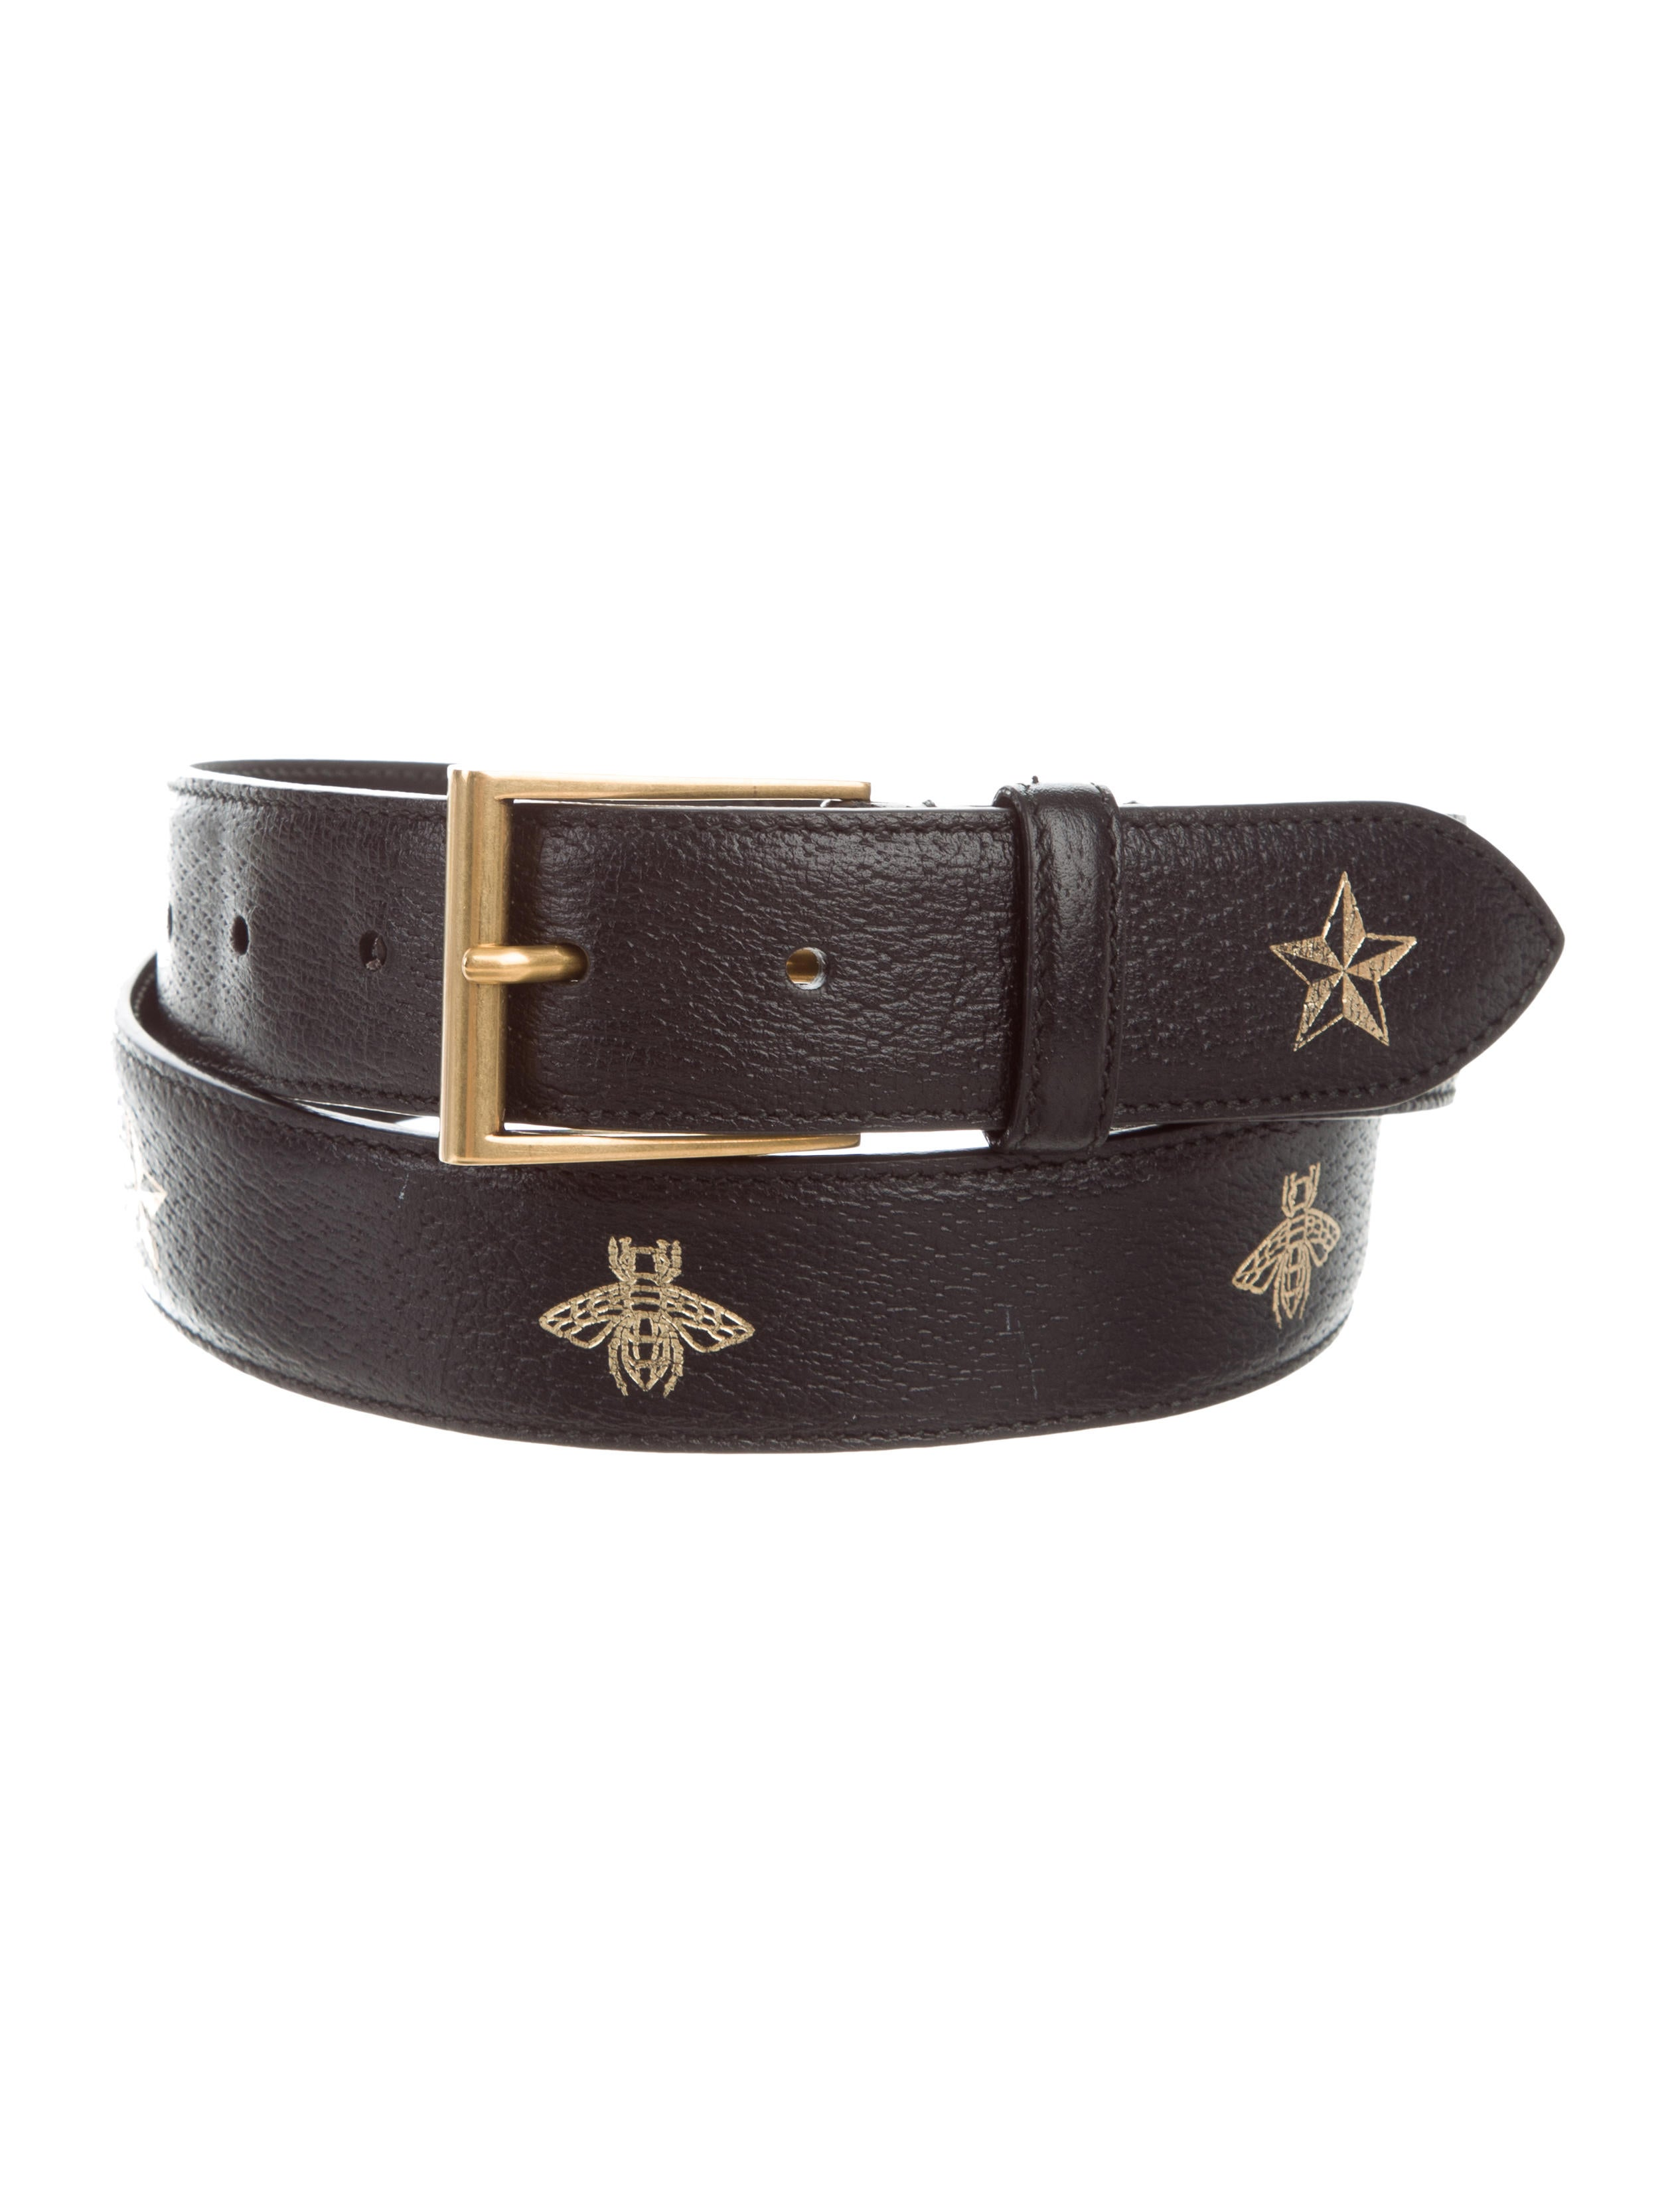 9f2ac78f584 Gucci Bee   Star Leather Belt - Accessories - GUC286933